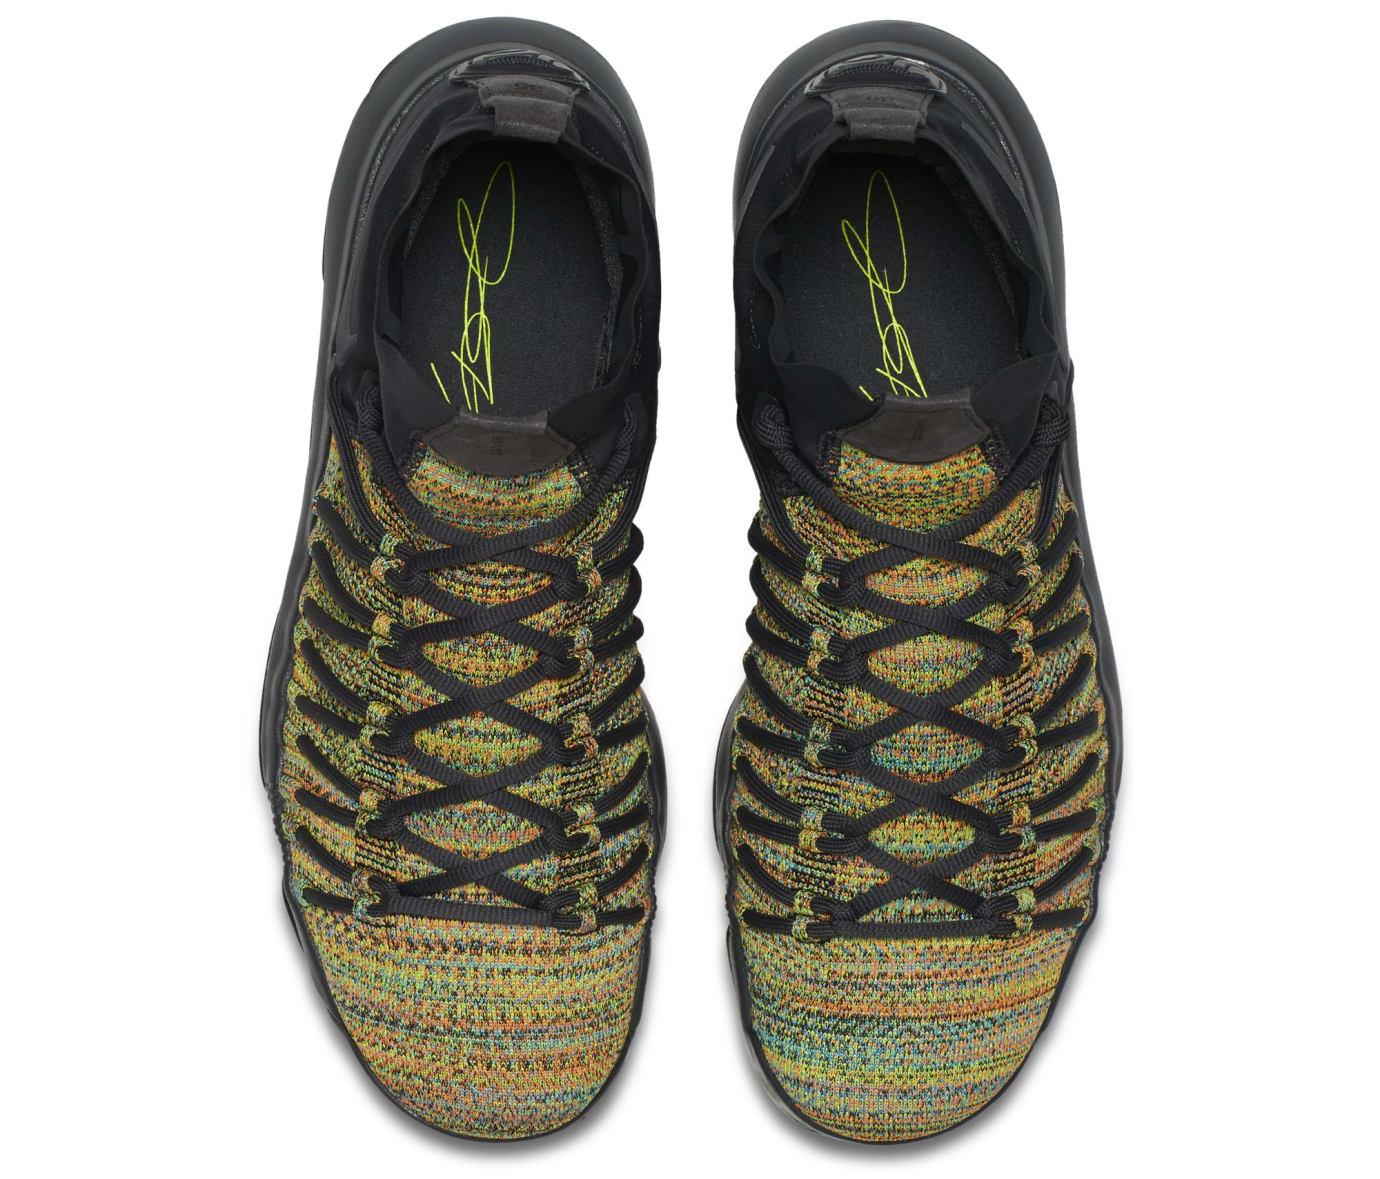 brand new 2f644 08cca Image via NikeUS11 Nike Zoom KD 9 Elite